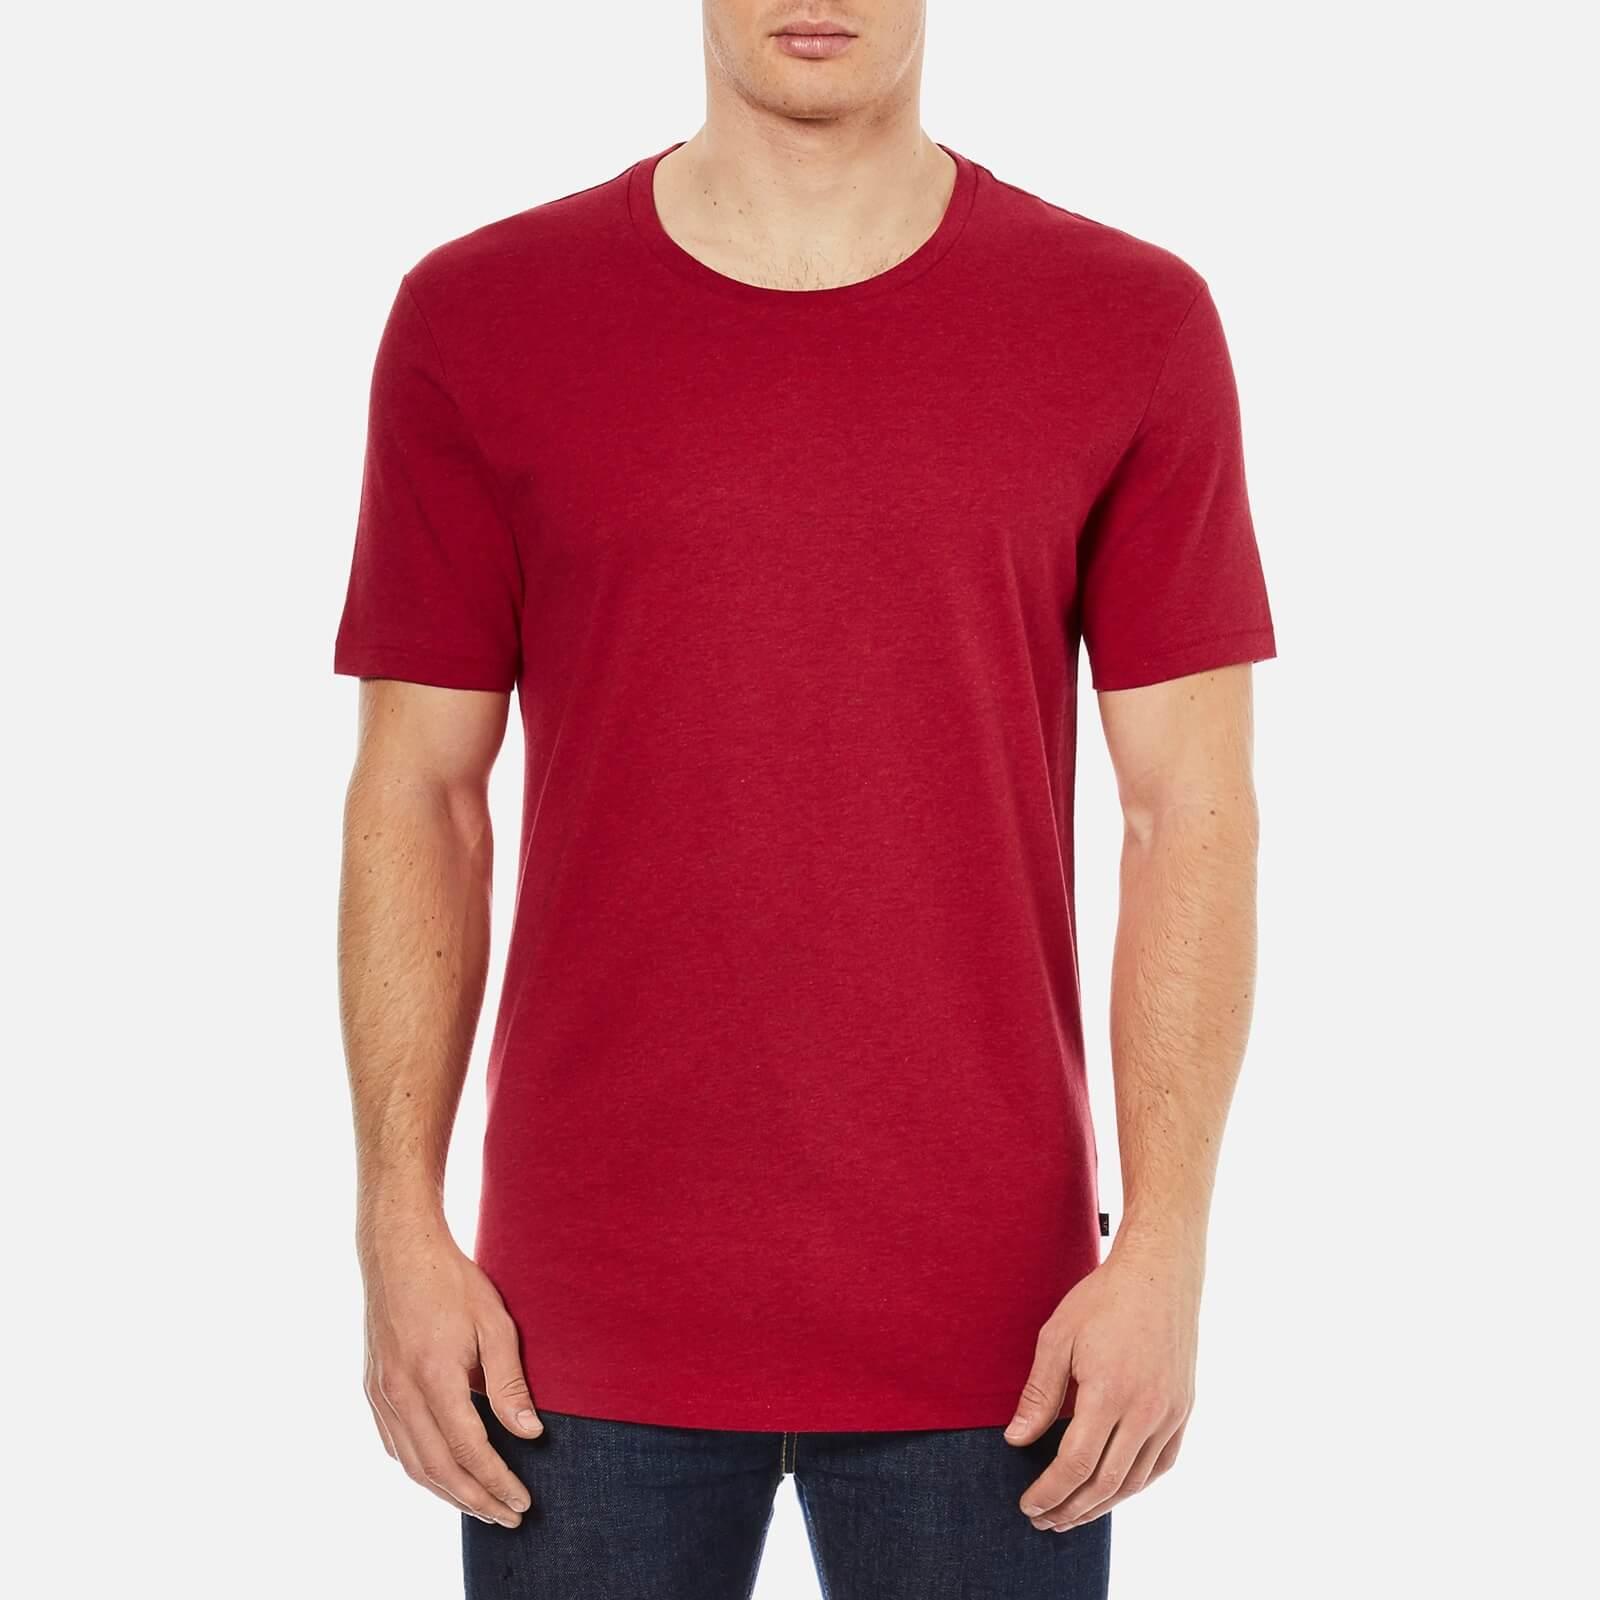 dbb3f80cbab ... J.Lindeberg Men s Axtell Crew Neck Slim Fit T-Shirt - Red Deep Melange